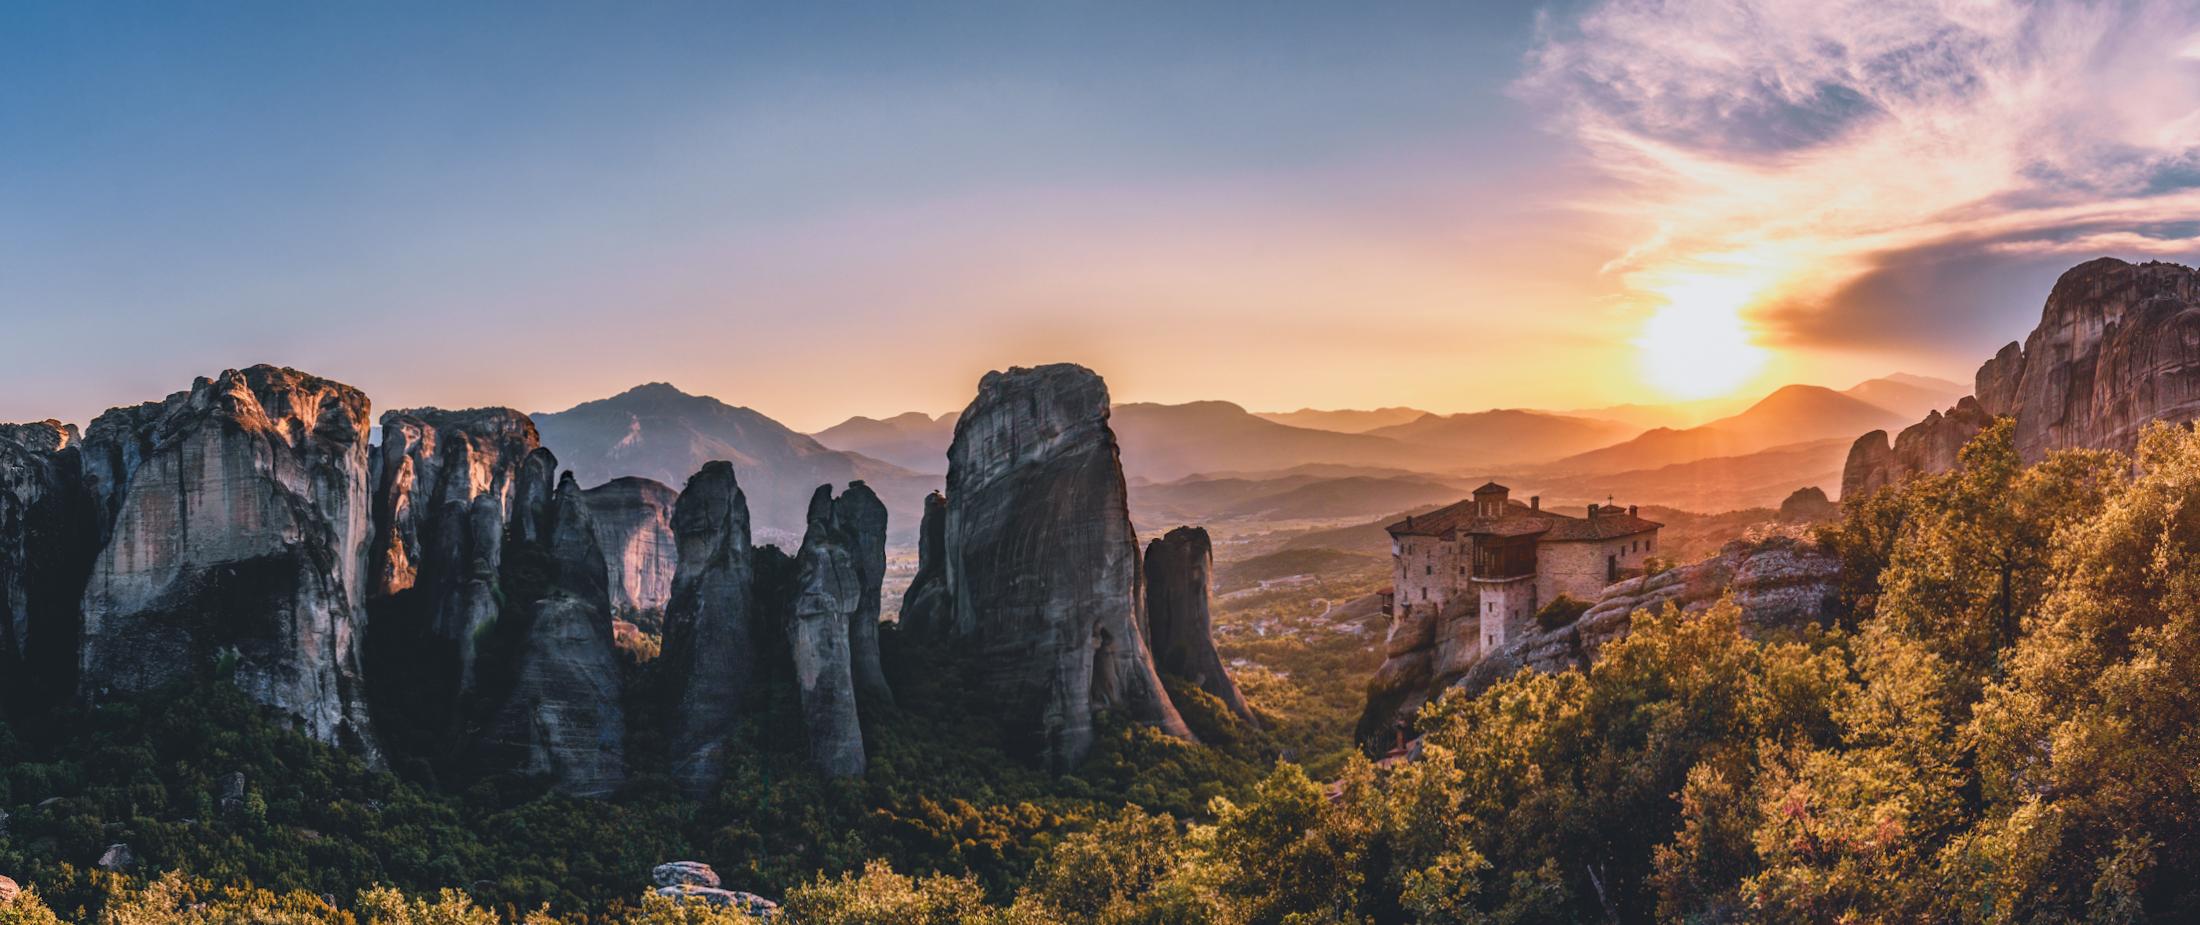 Atena – Korint – Delfi – Hosios Loukas – Kalambaka – Meteora – Solun – Filipi – Kavala – Berija – Ohrid – Tirana – Crnogorsko primorje – Boka Kotorska